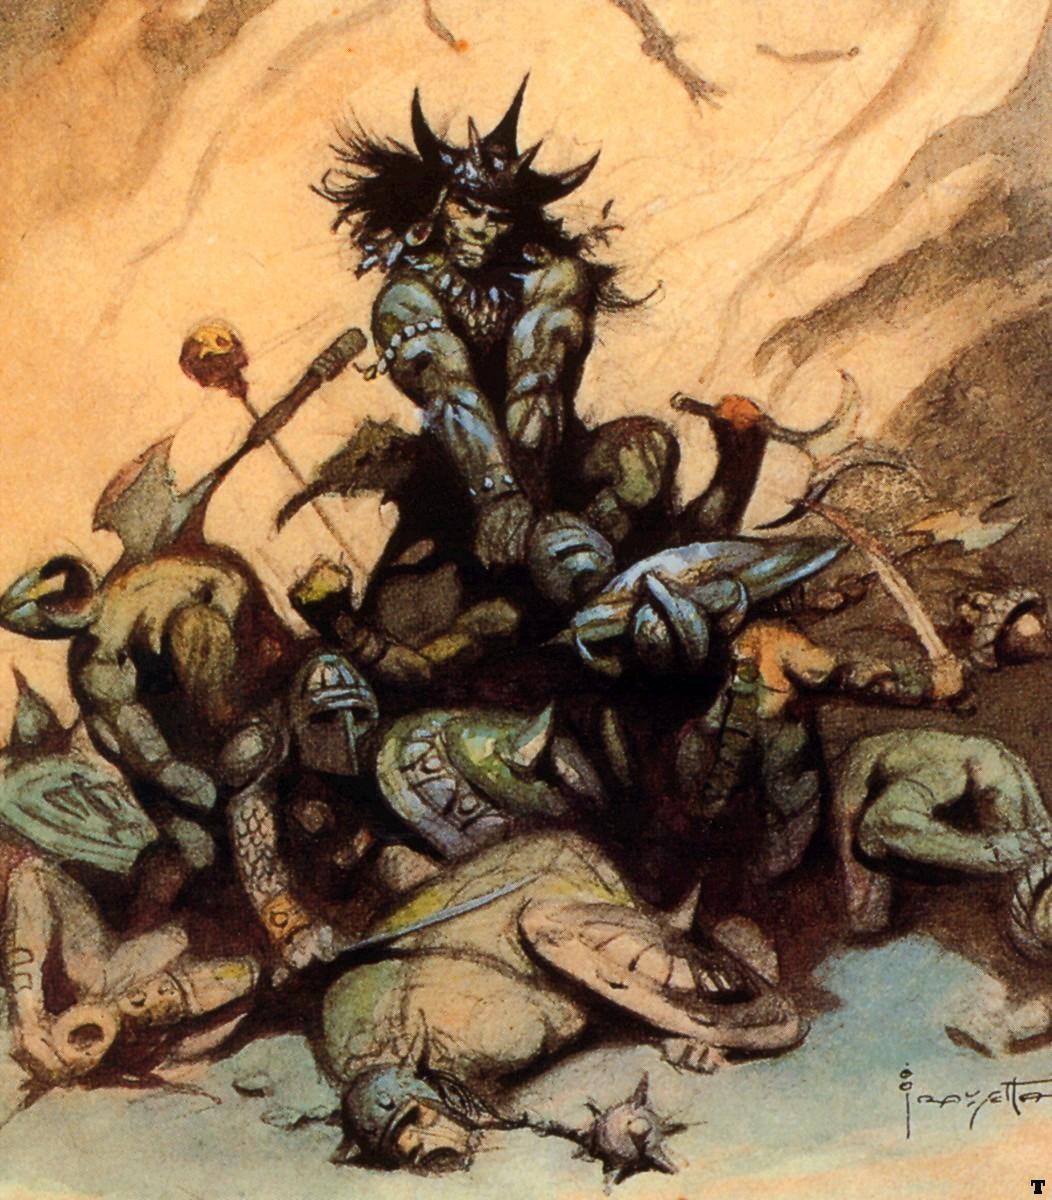 METAL ON METAL: Frank Frazetta, epic fantasy